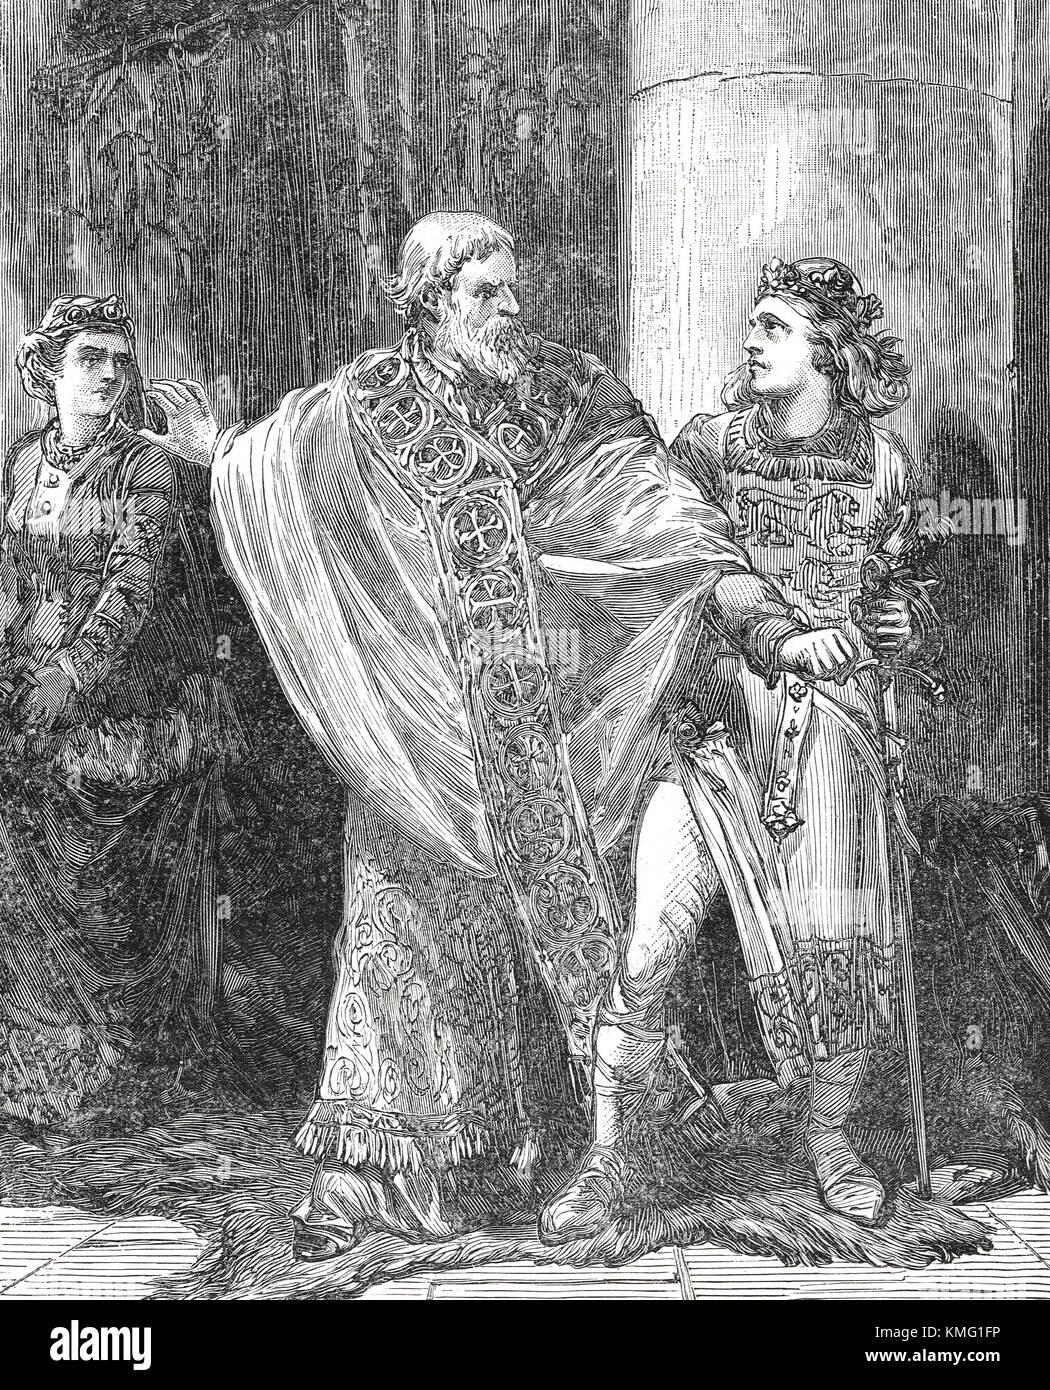 Dunstan strafte edwy in Anwesenheit von elgiva, Krönung Tag, AD 955 Stockbild